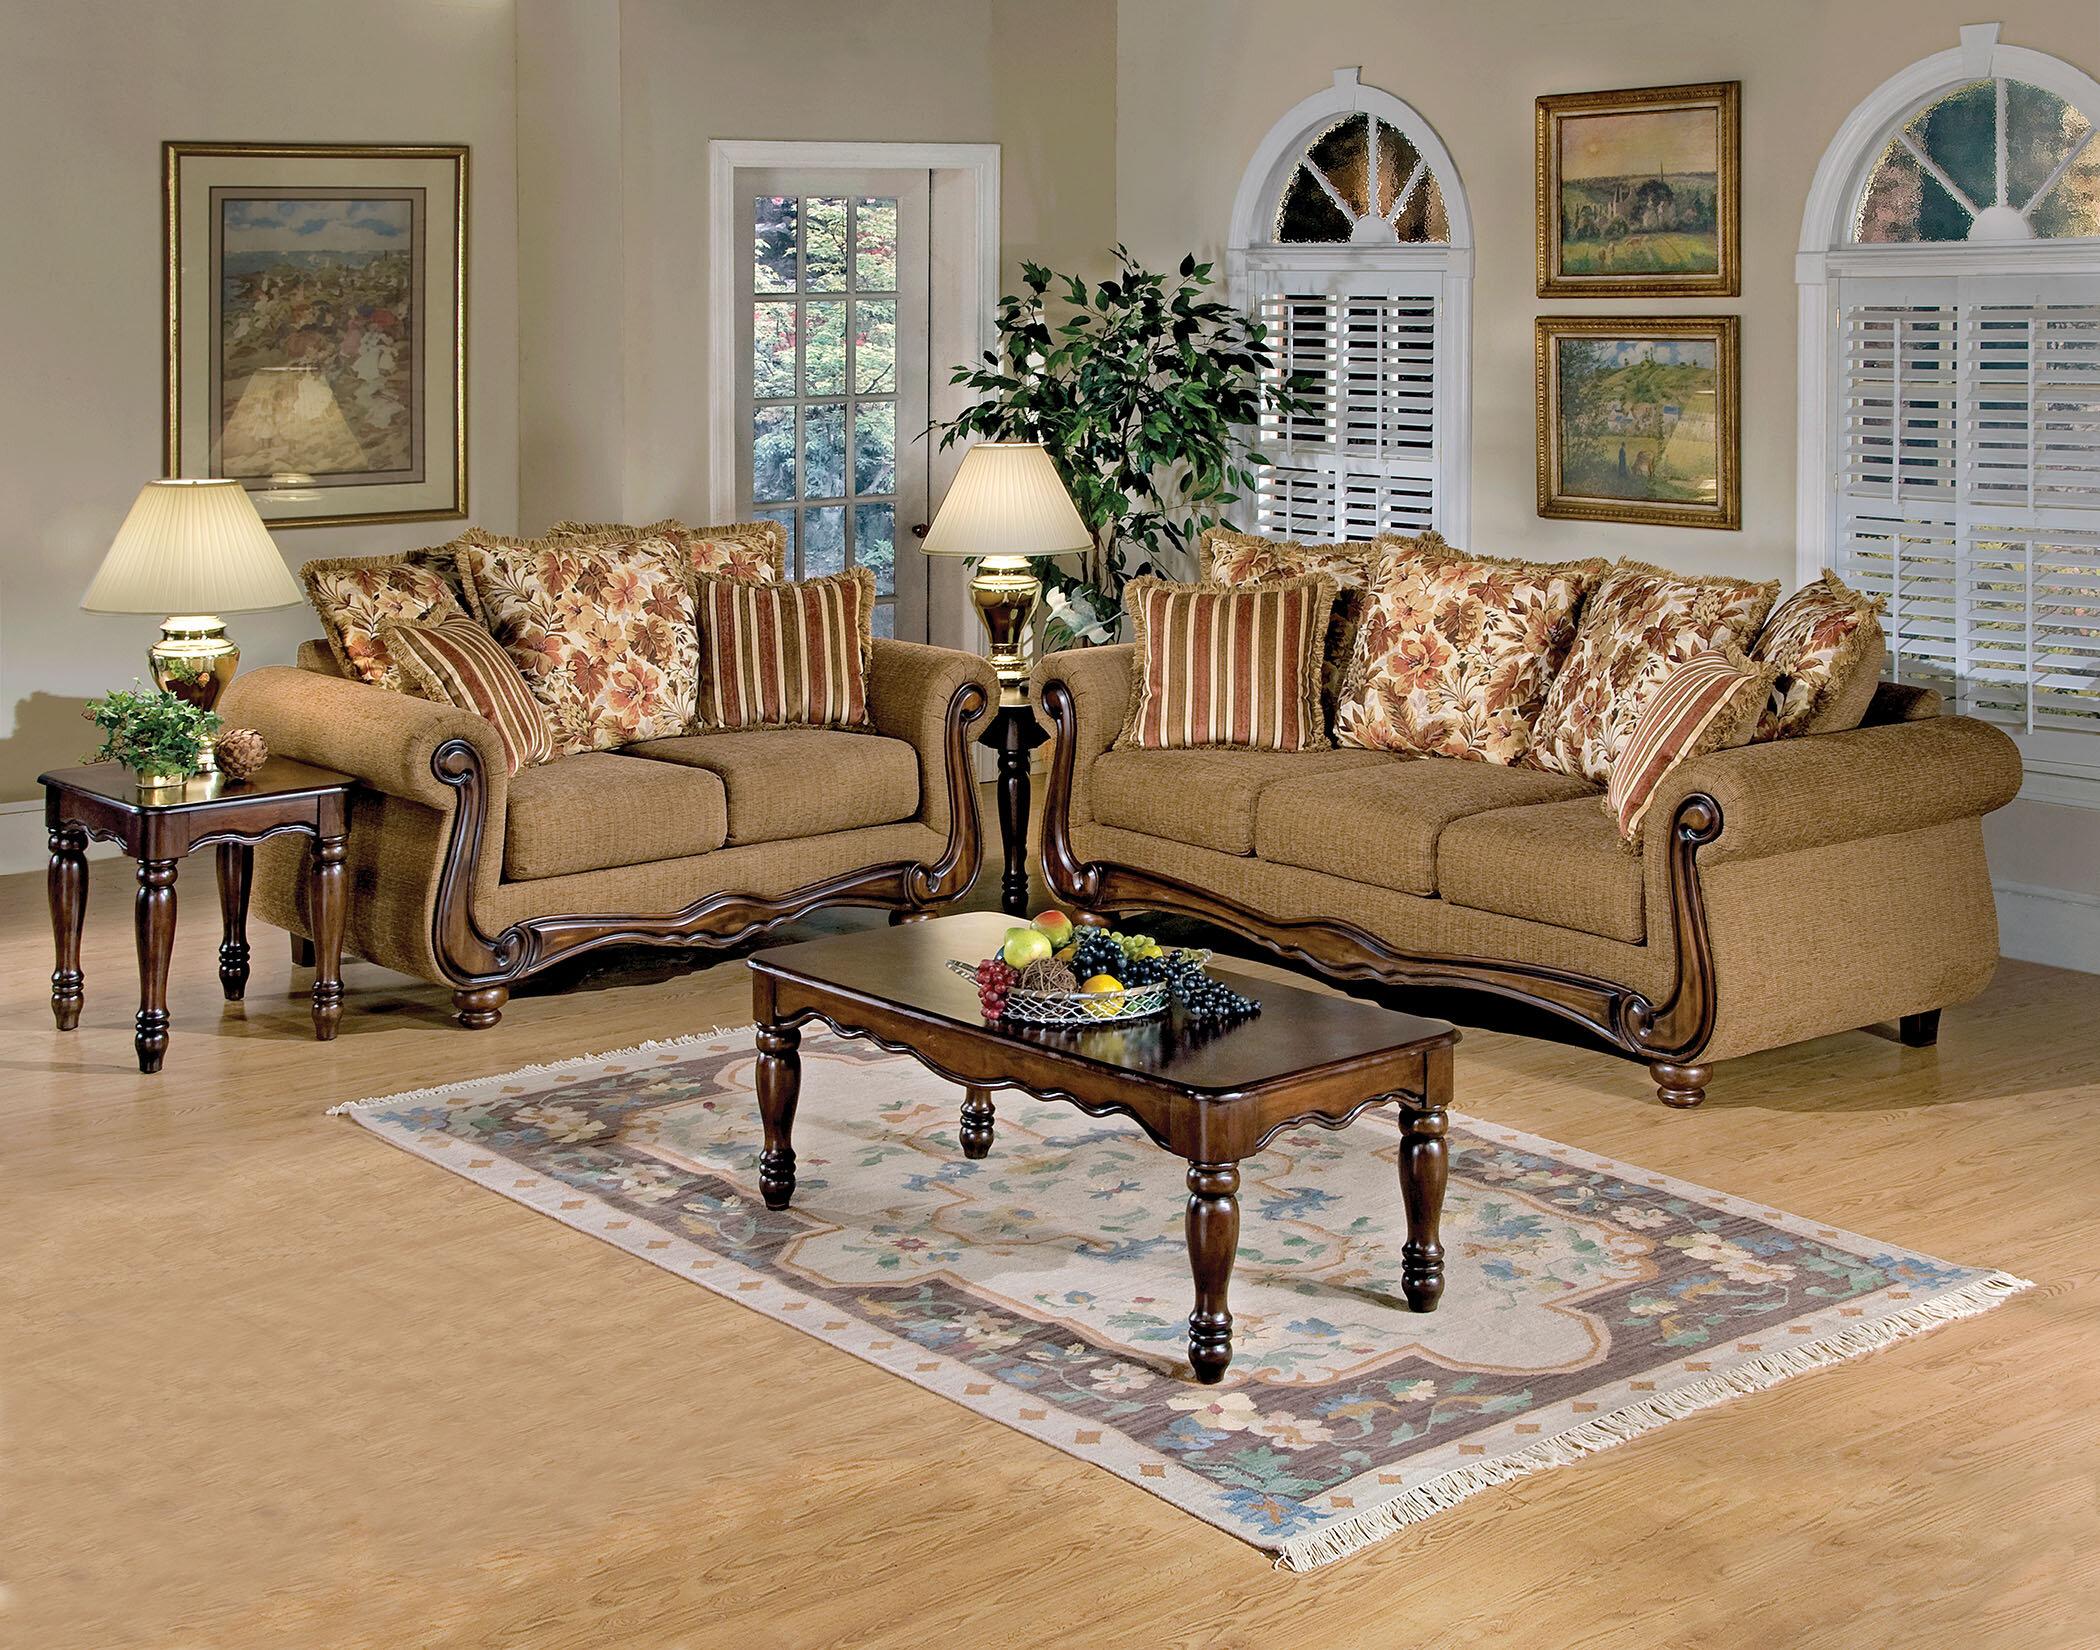 Aj homes studio olysseus configurable living room set wayfair